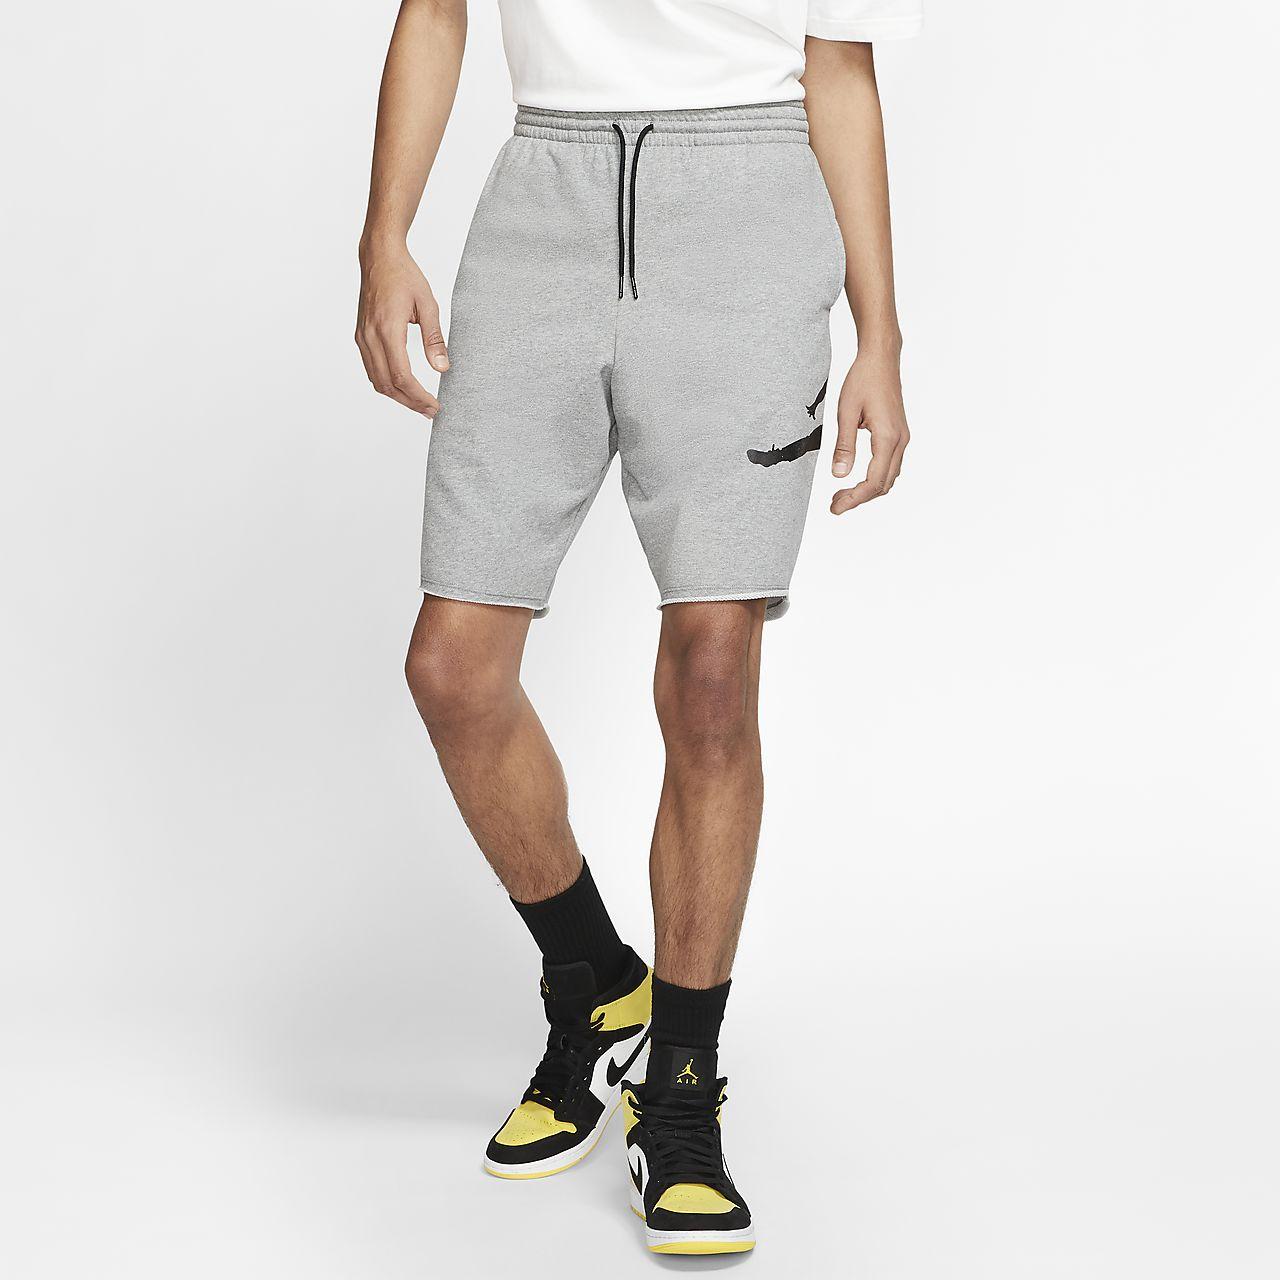 9639c2eecbc048 Jordan Jumpman Logo Men s Fleece Shorts. Nike.com NO